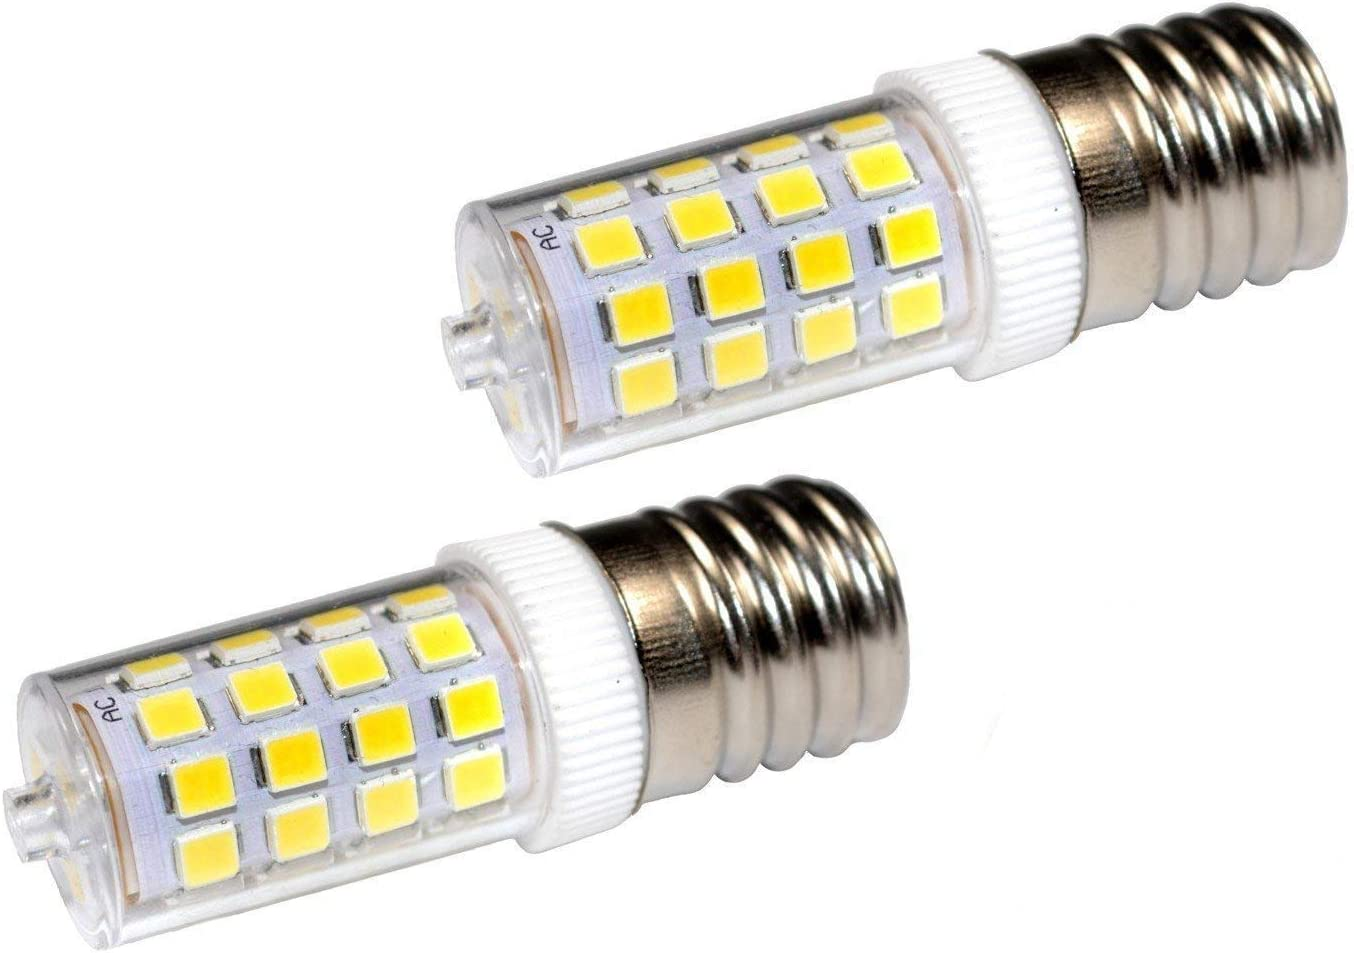 HQRP 2 piezas 220V E17 LED Bulbo Regulable Blanco Frio compatible con LG 6912W1Z004B Bombilla de microondas Reemplazo, HQRP Portavasos